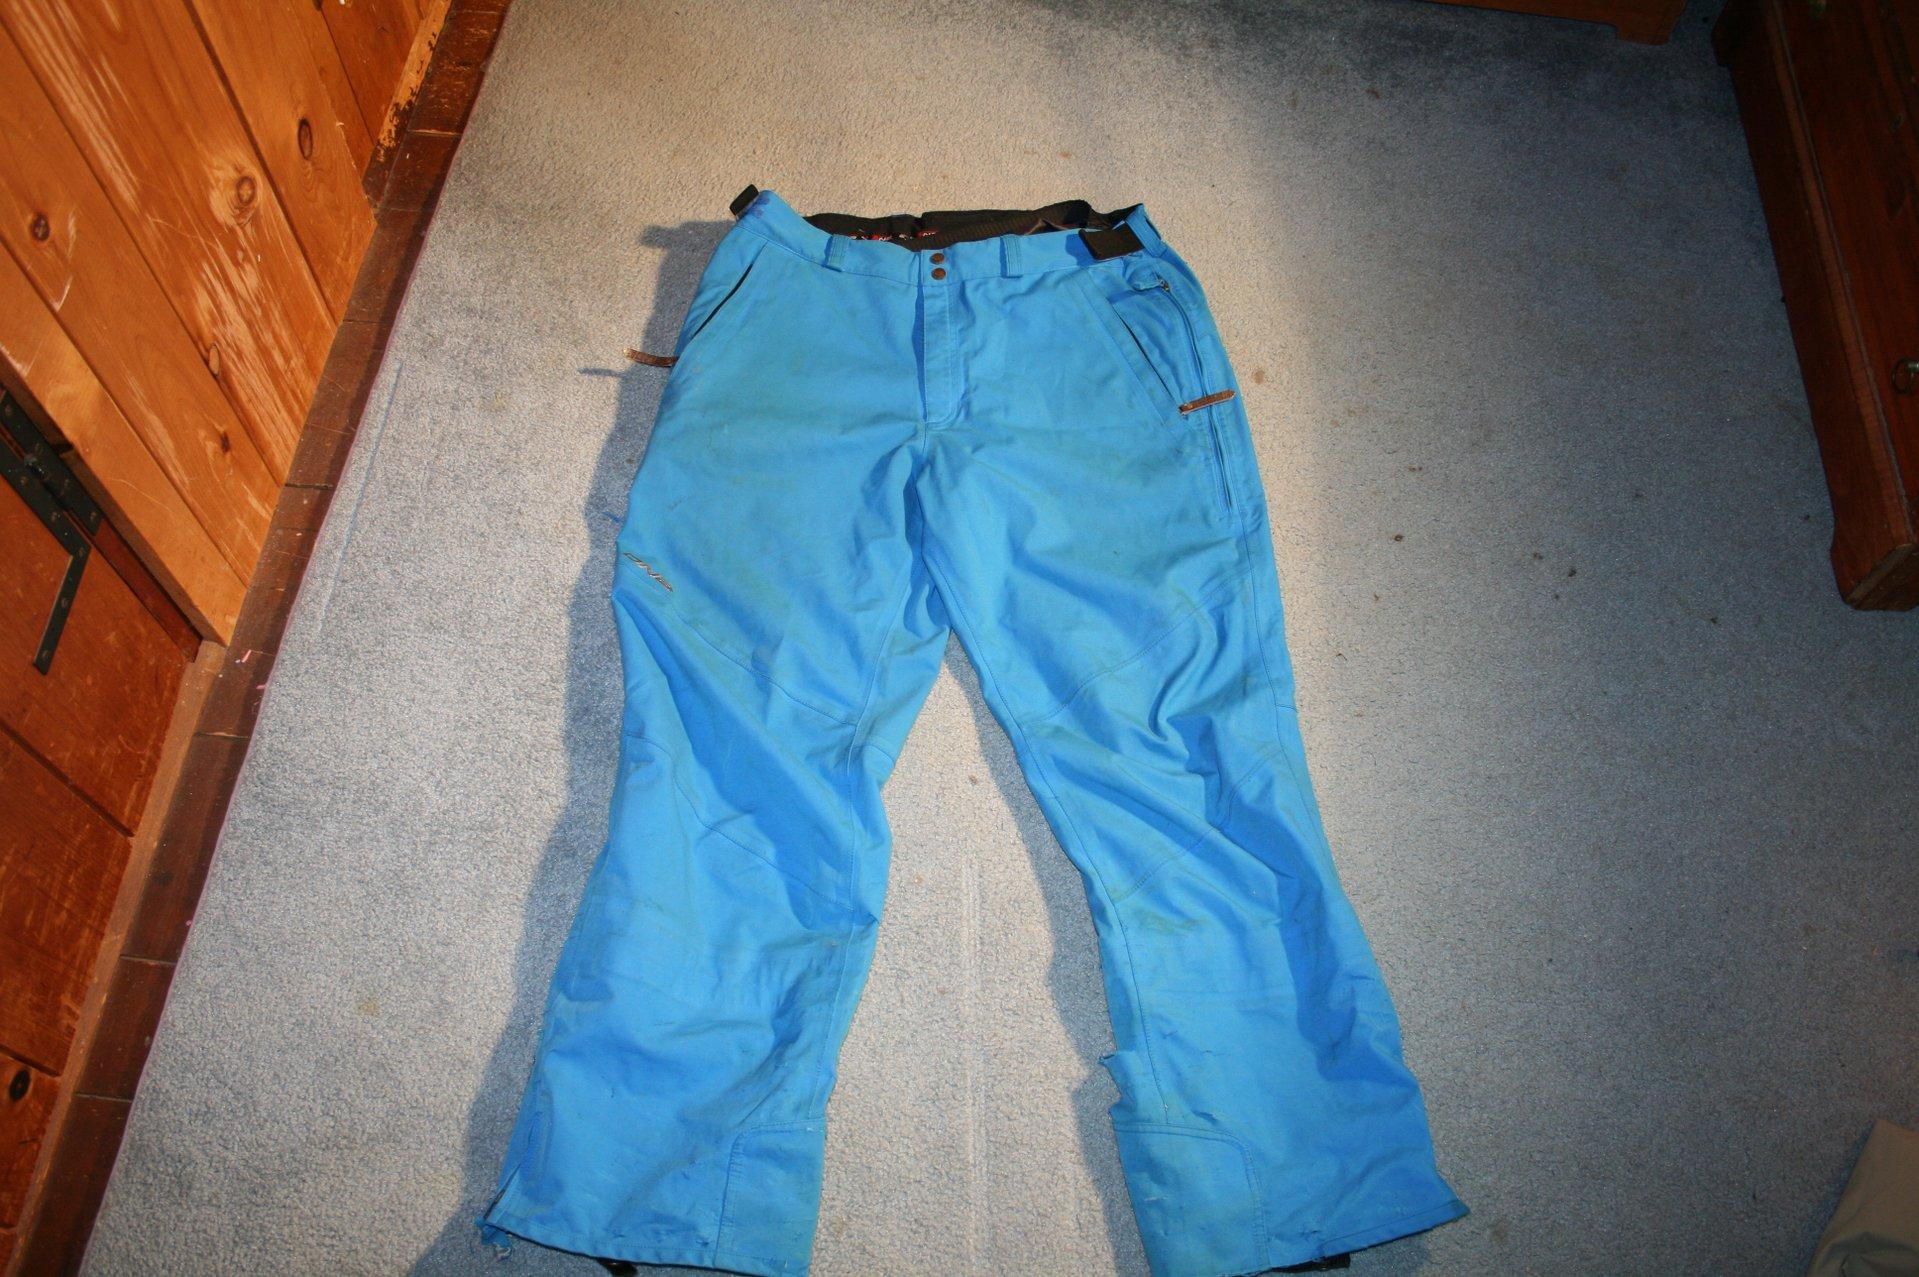 DNA blue pants front